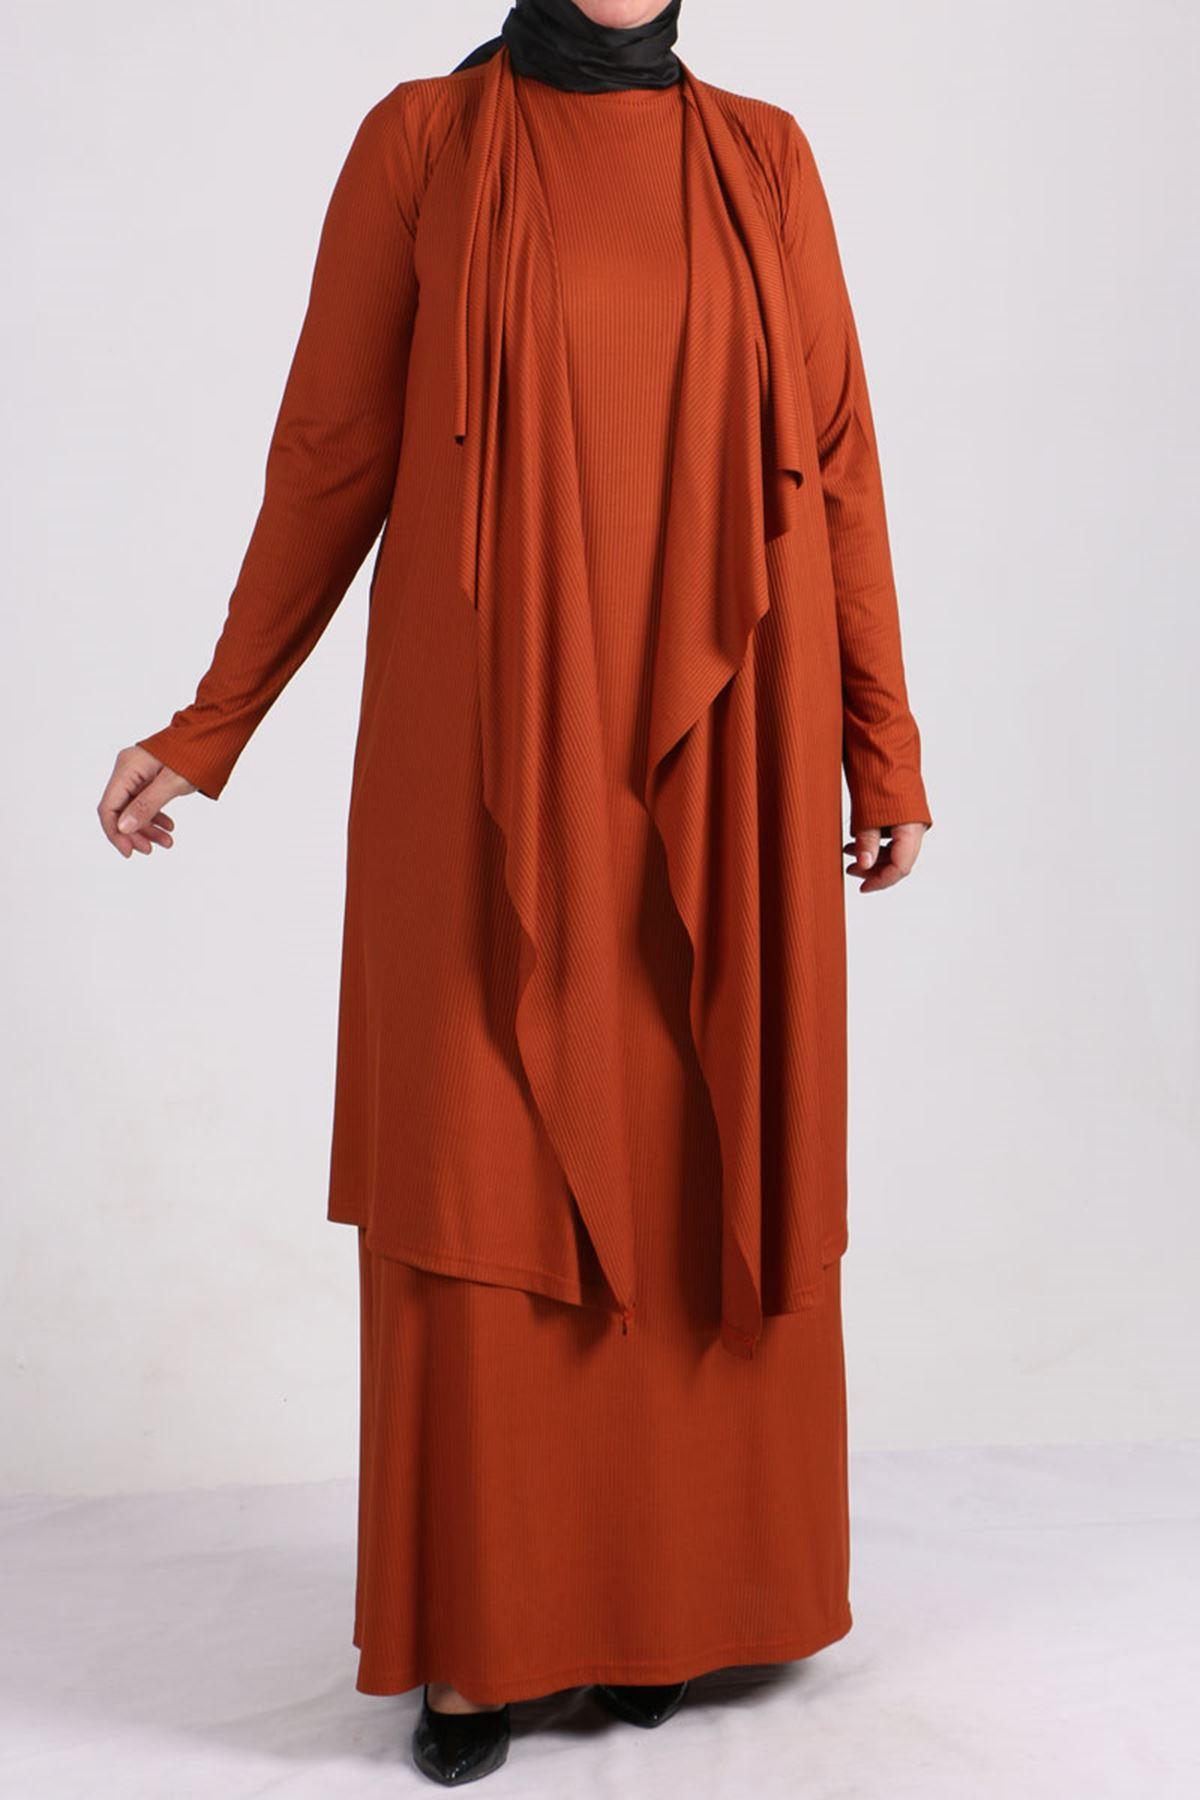 7201 طقم فستان و جاكيت مقاس كبير - قرميدي